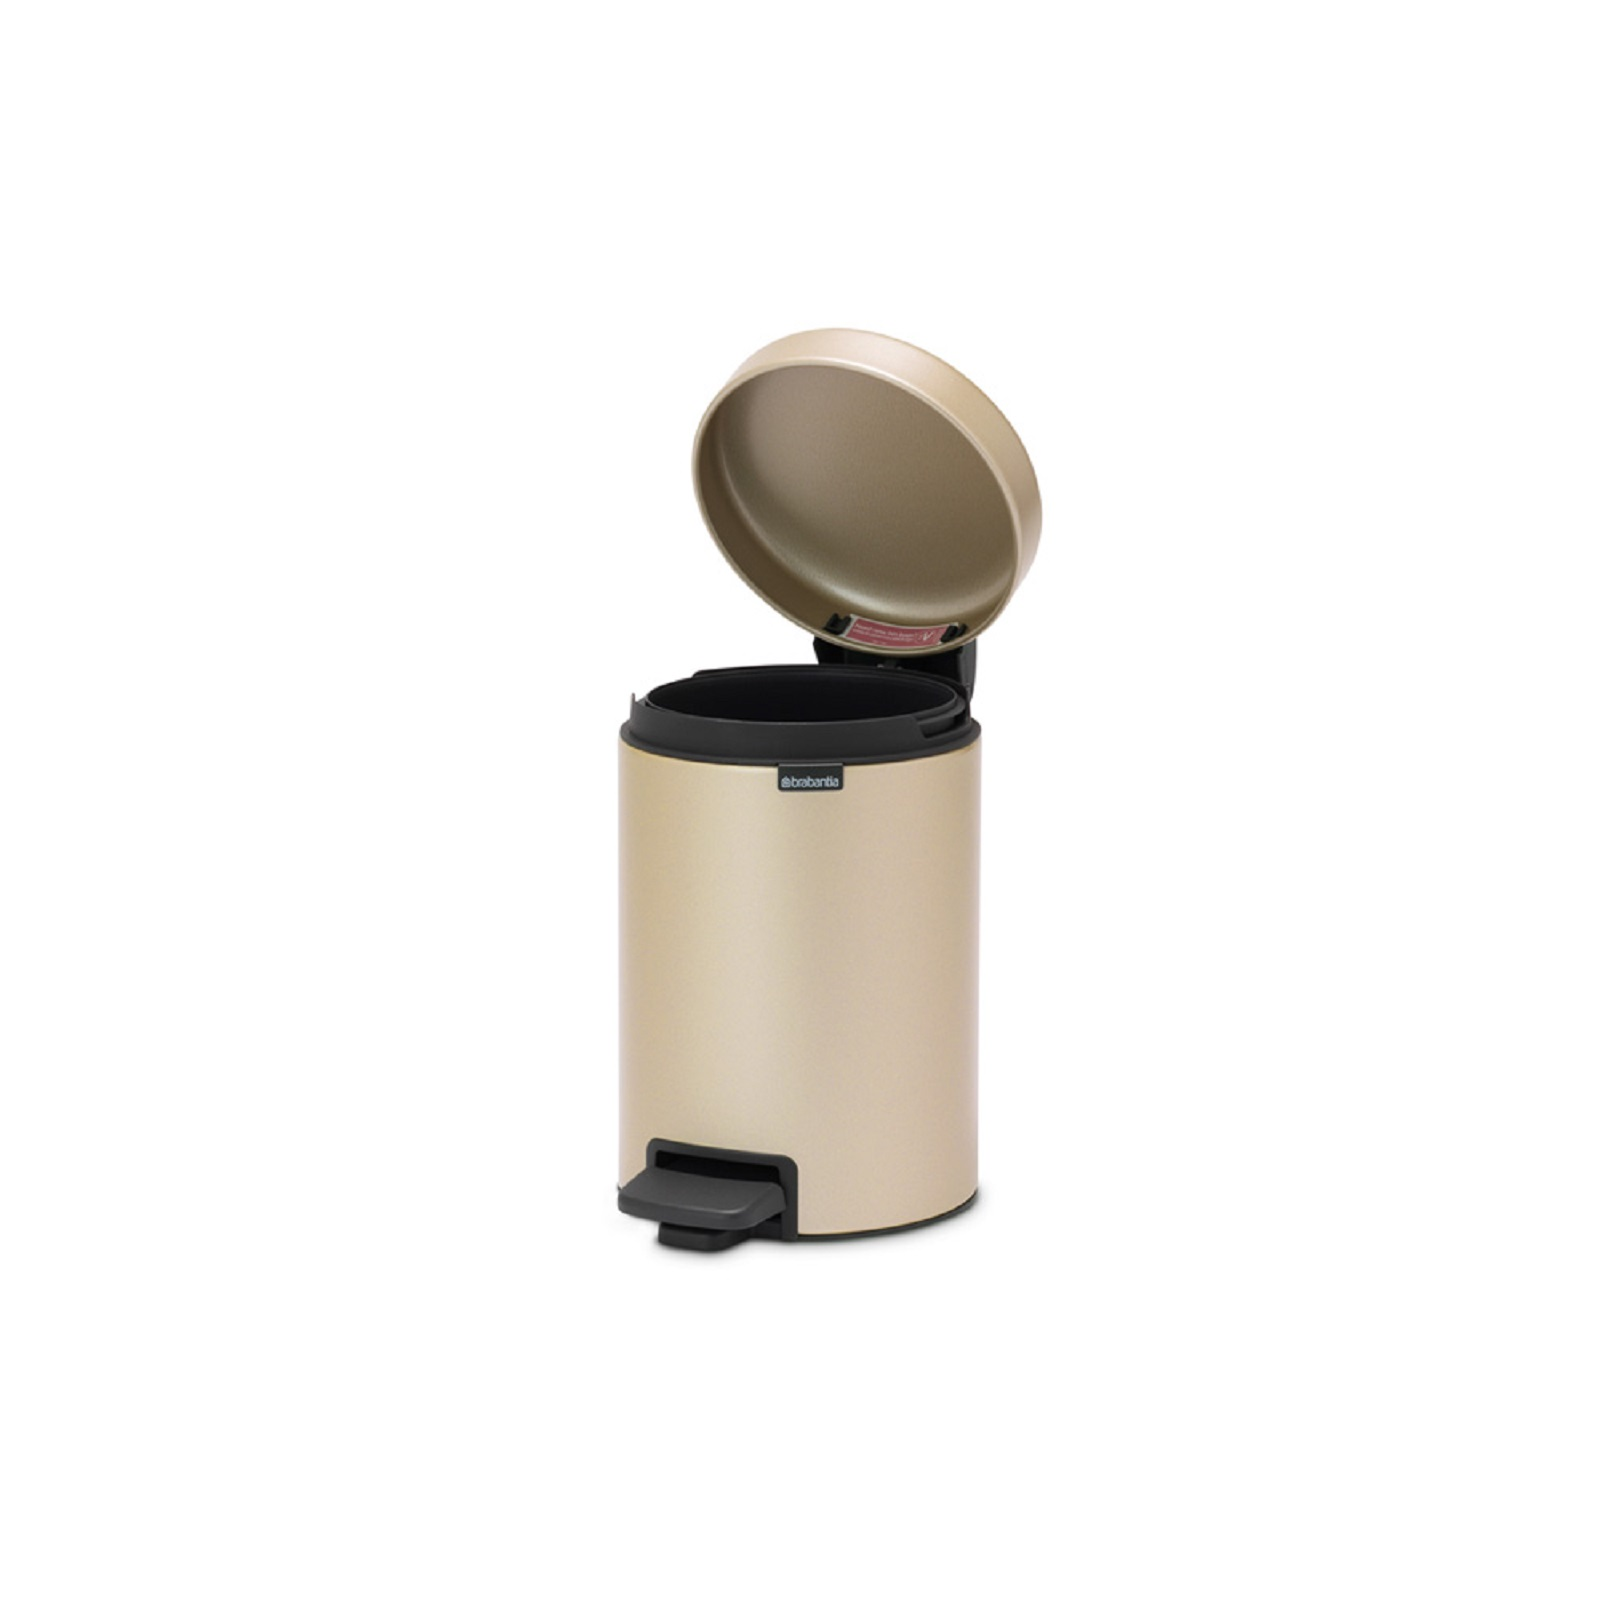 Бак для мусора Pedal Bin NewIcon Brabantia, объем 3 л, шампань бежевый Brabantia 304408 фото 4